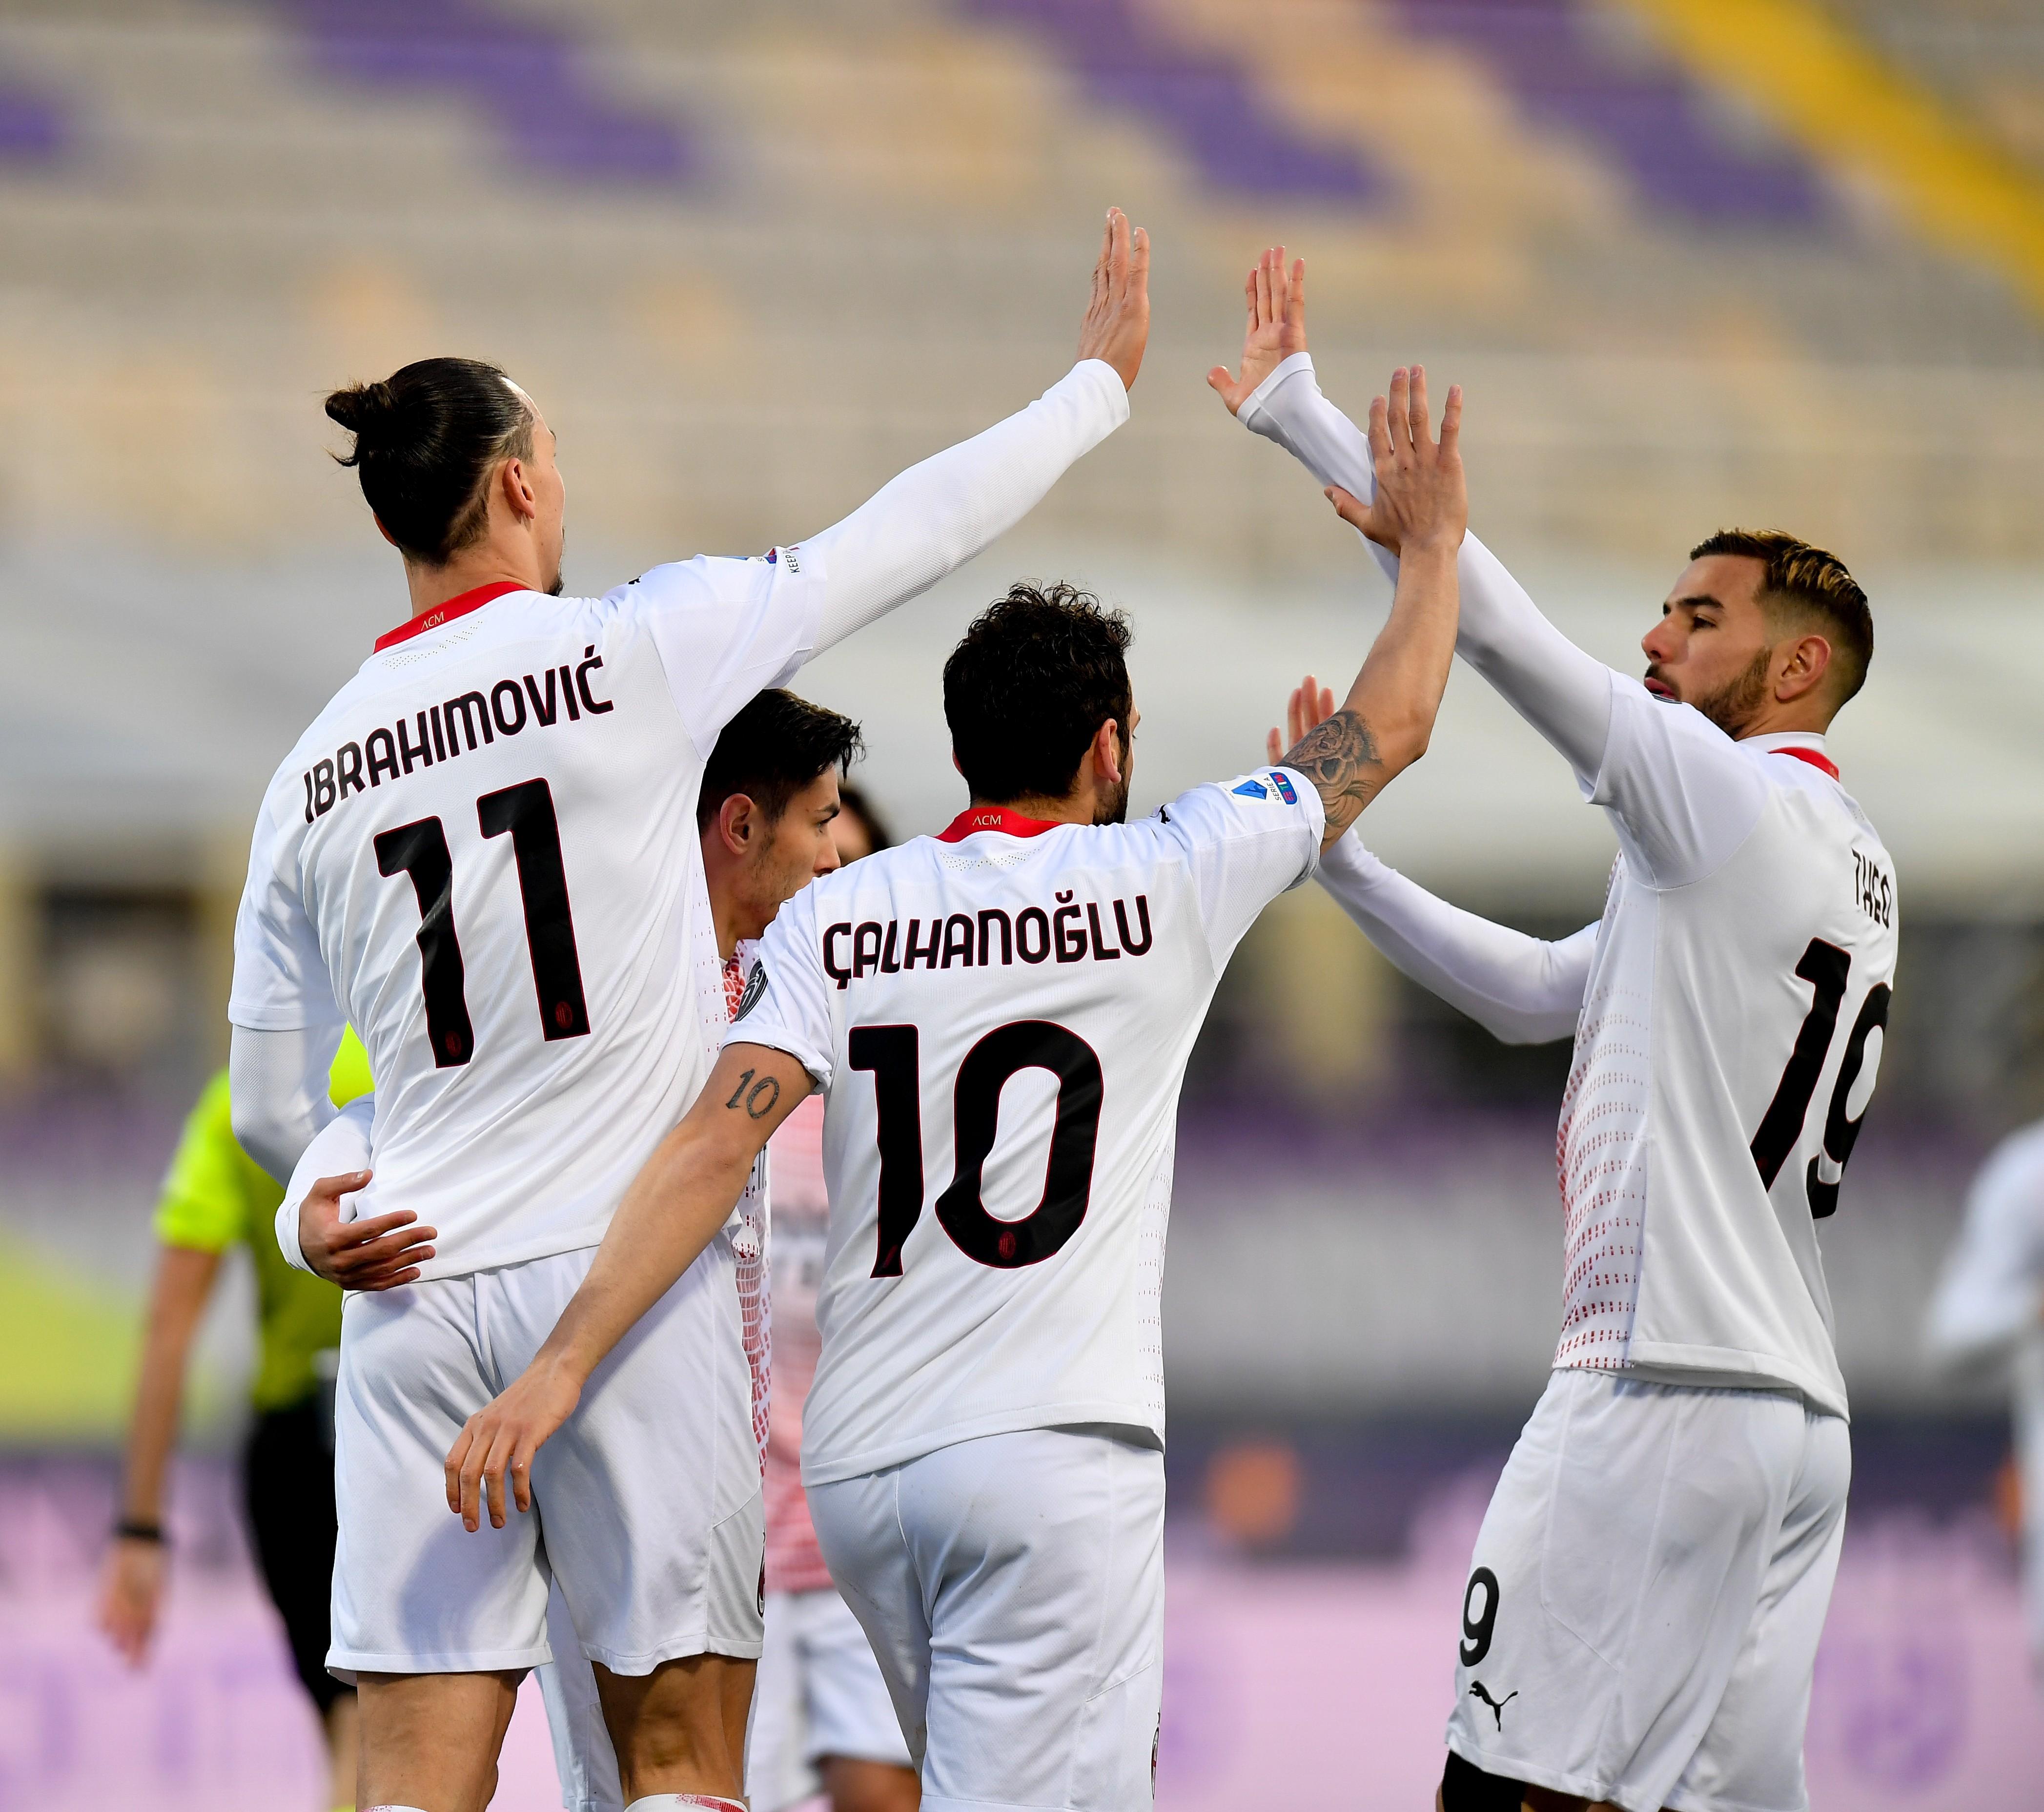 ITALY-FLORENCE-FOOTBALL-SERIE A-FIORENTINA VS AC MILAN